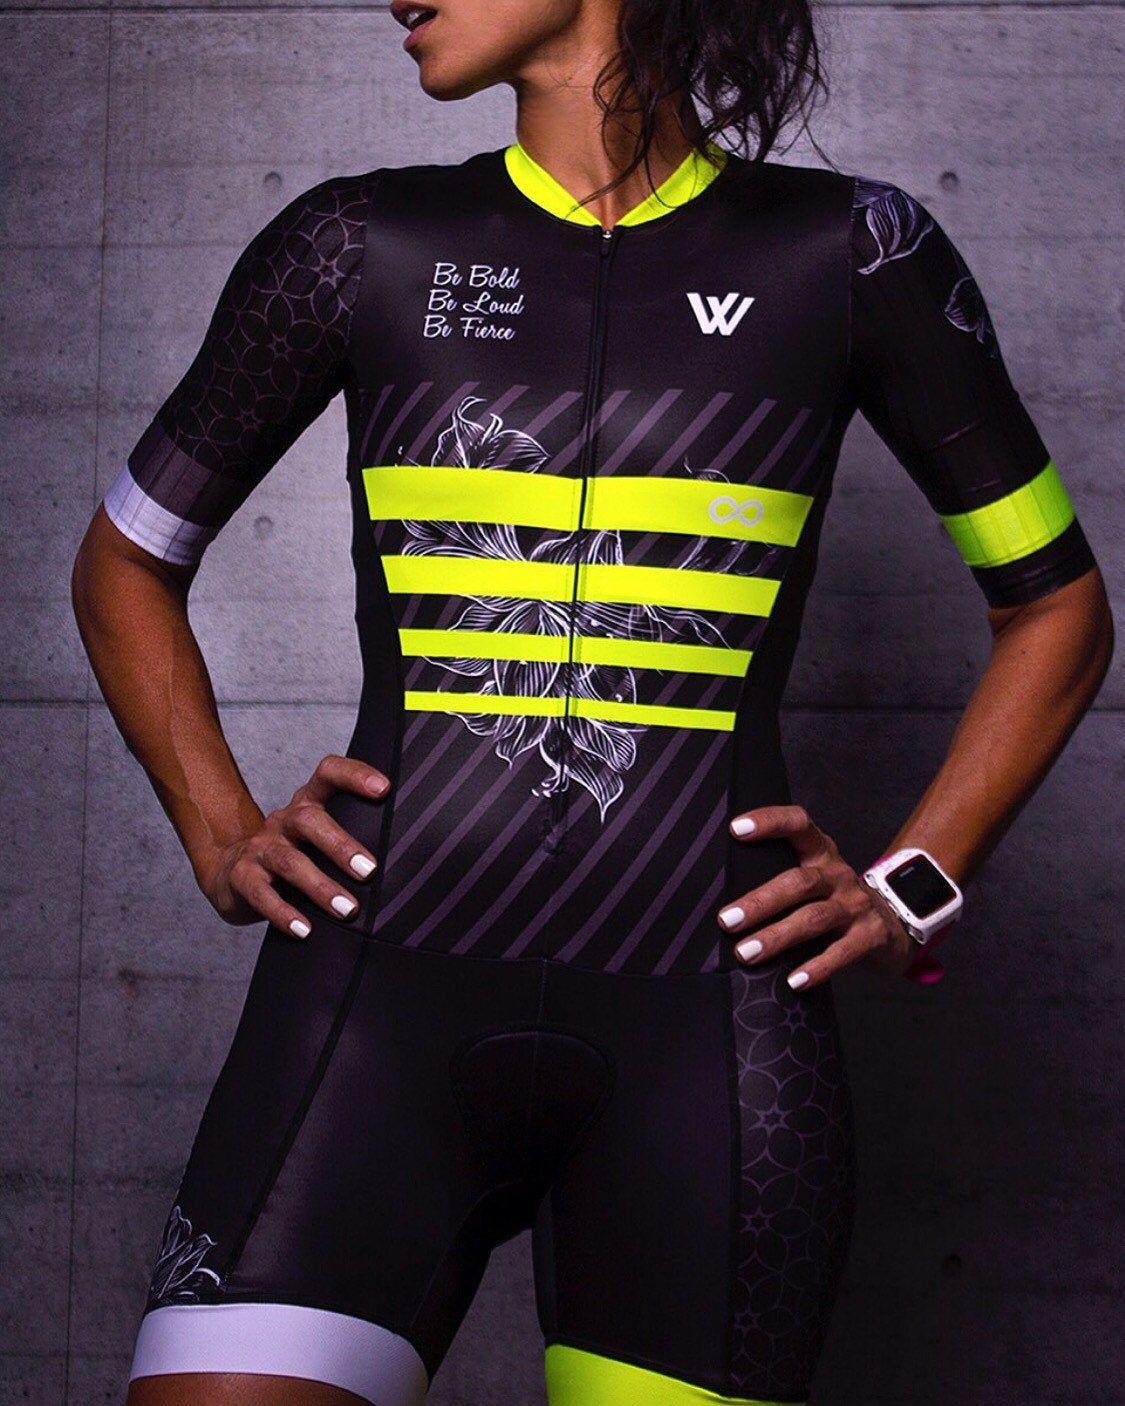 Download Trisuit Kit Cycling Kit Cycling Outfit Cycling Jersey Design Bike Jersey Design